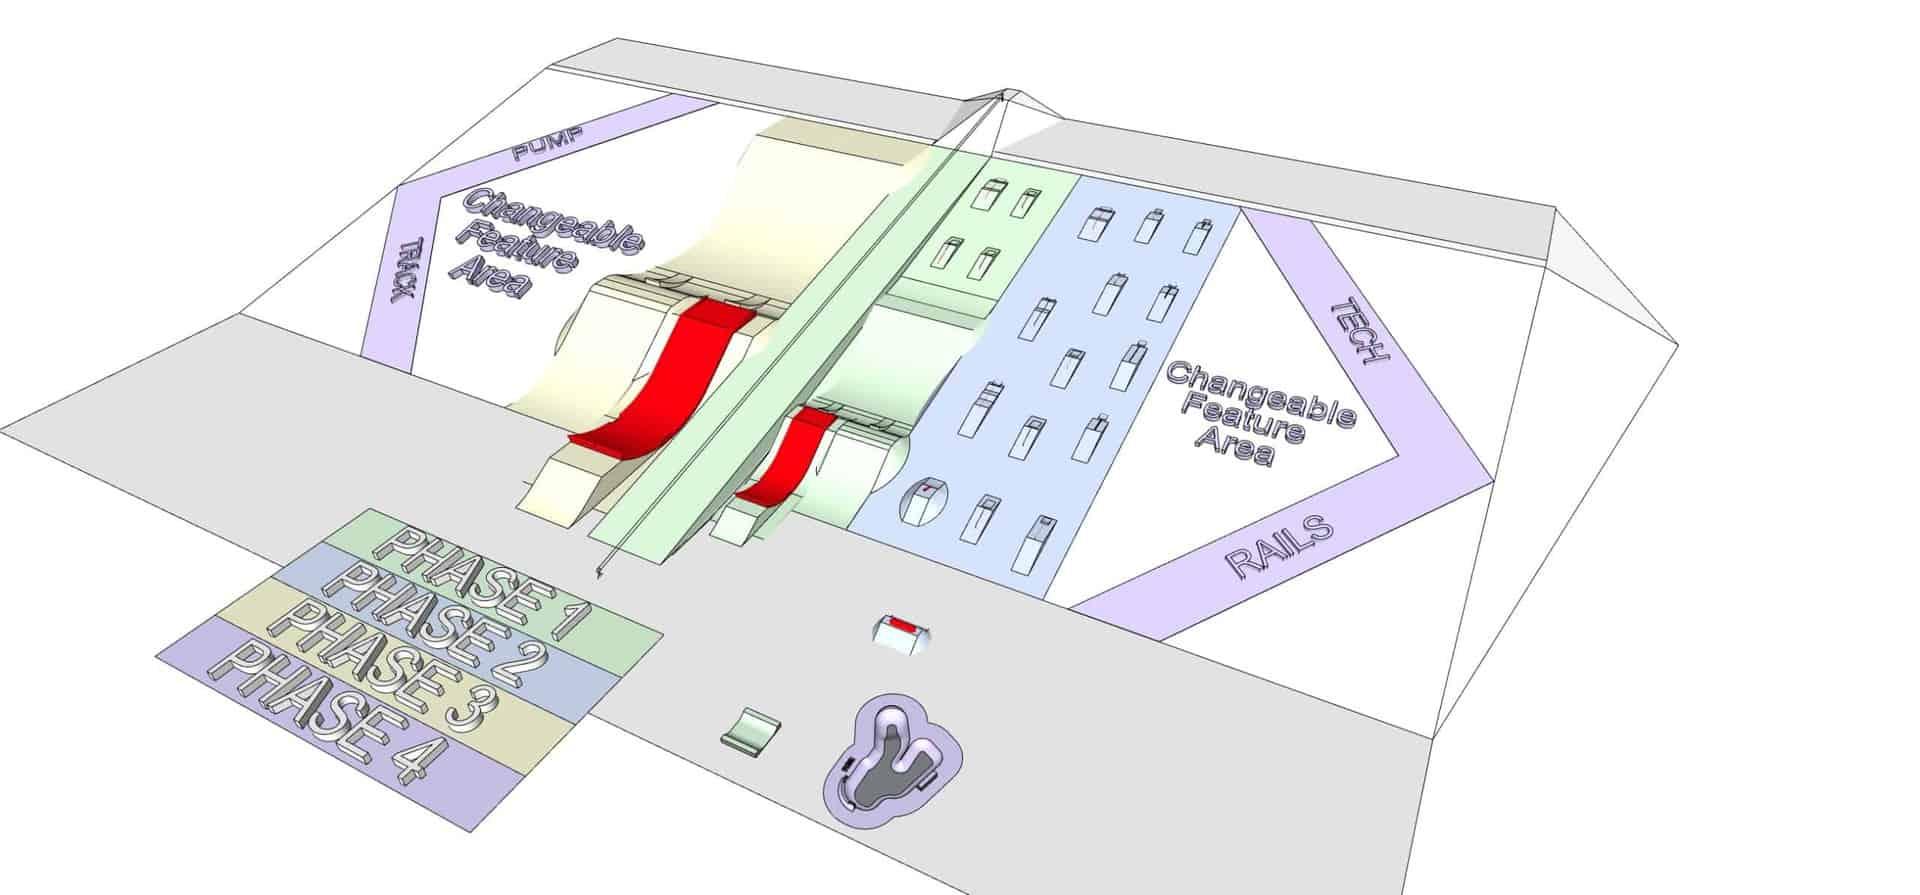 terrain park sketchup model